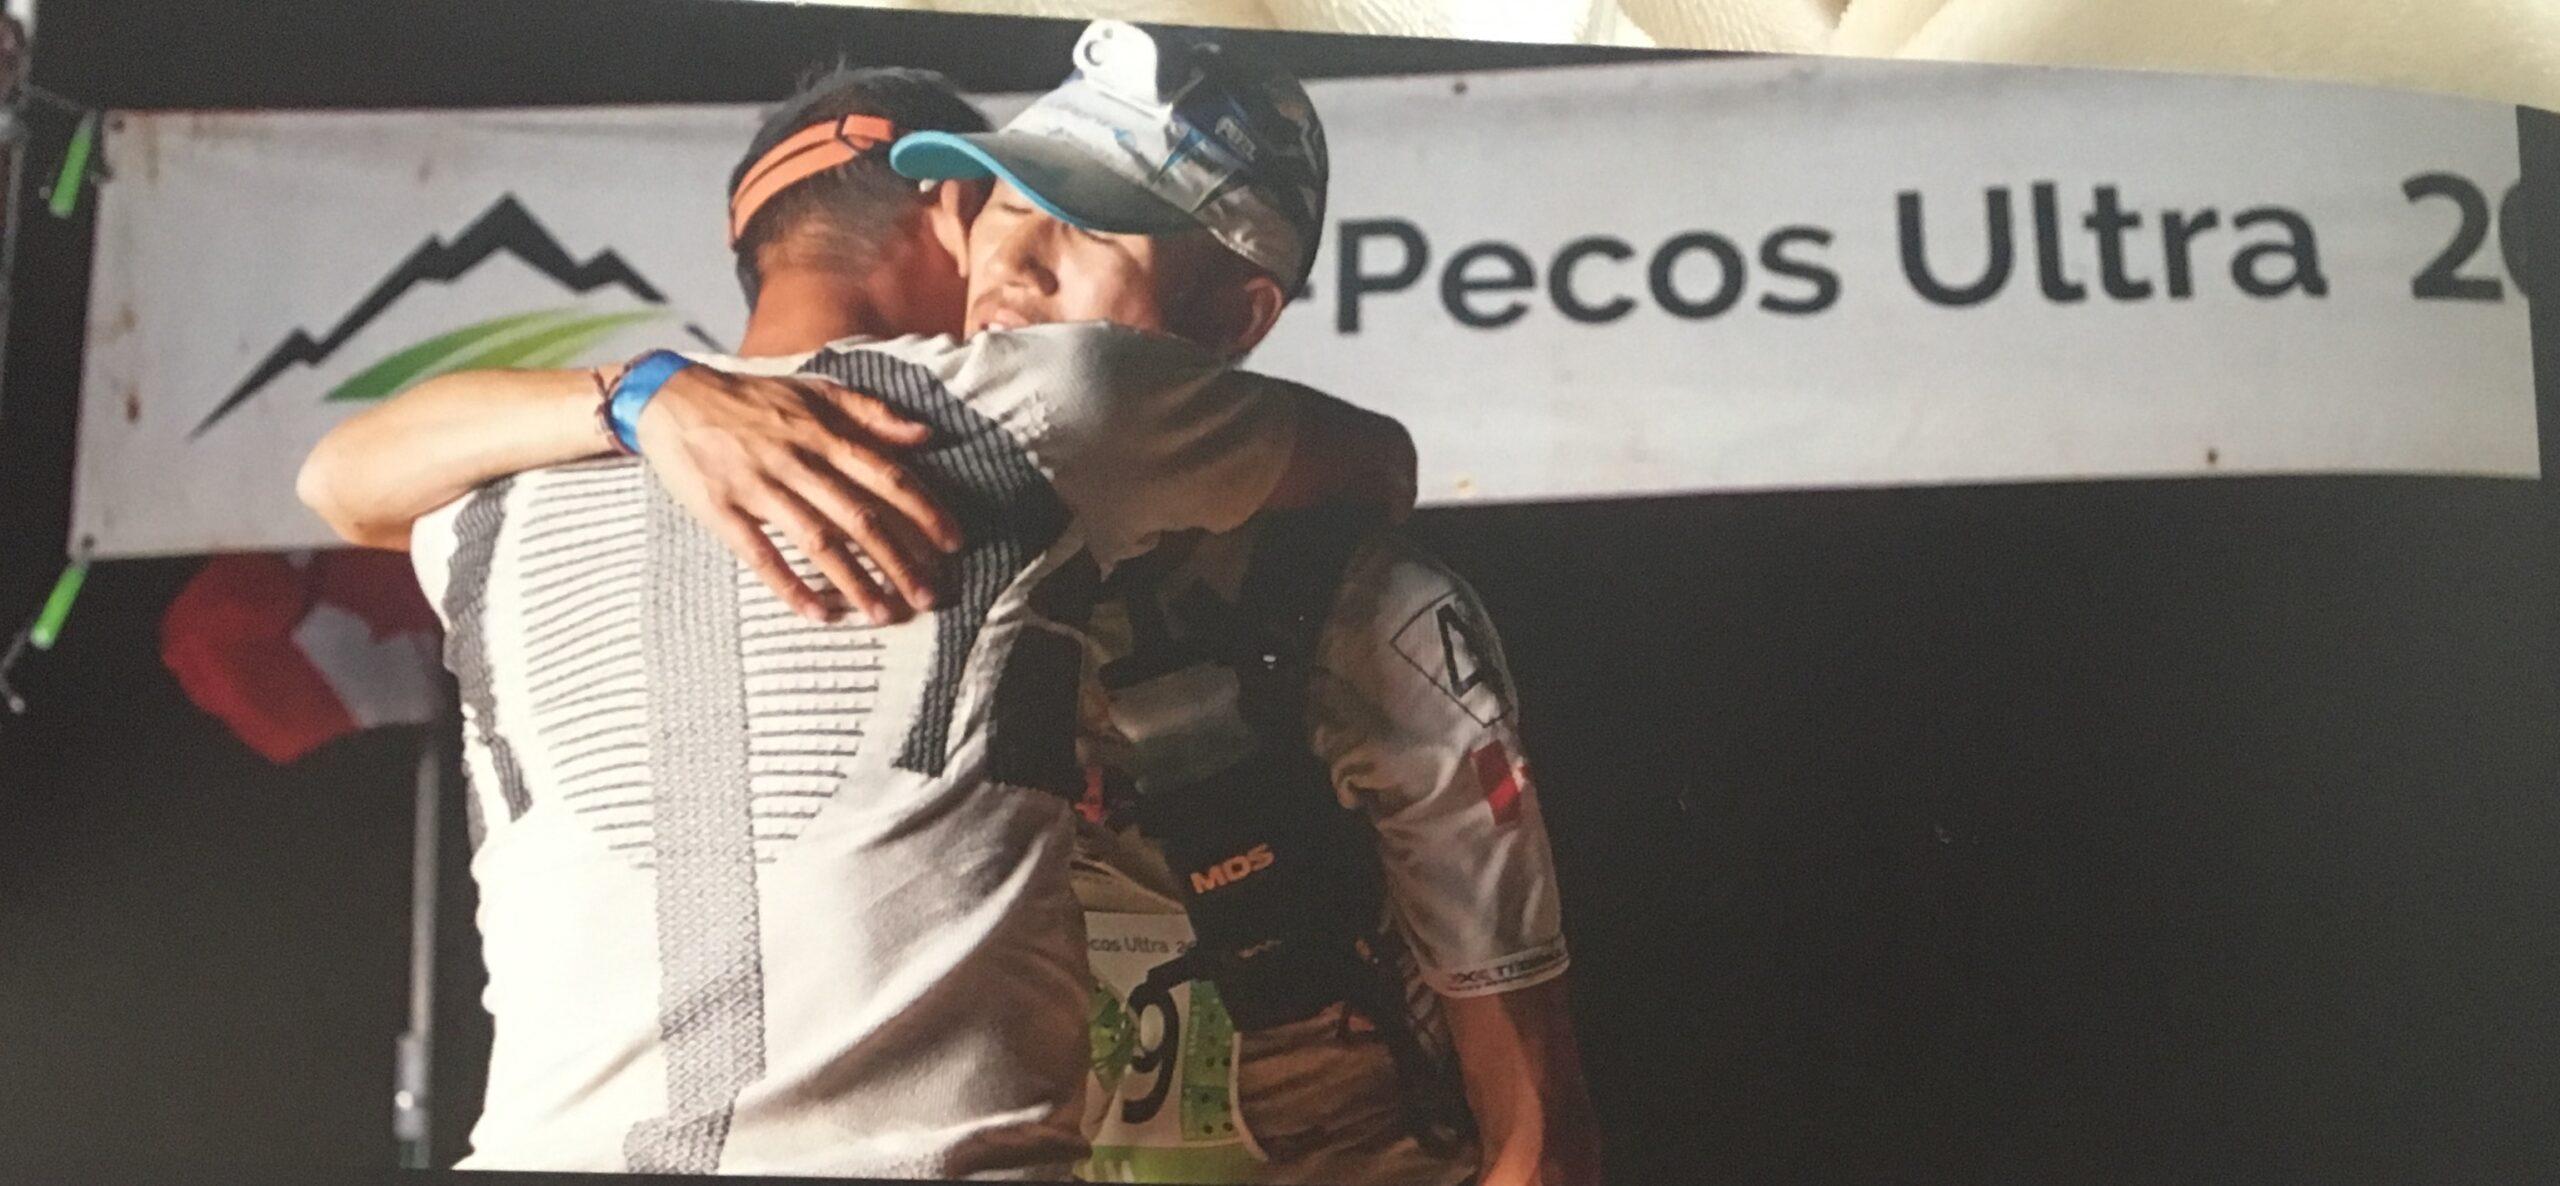 Trans Pecos Ultra